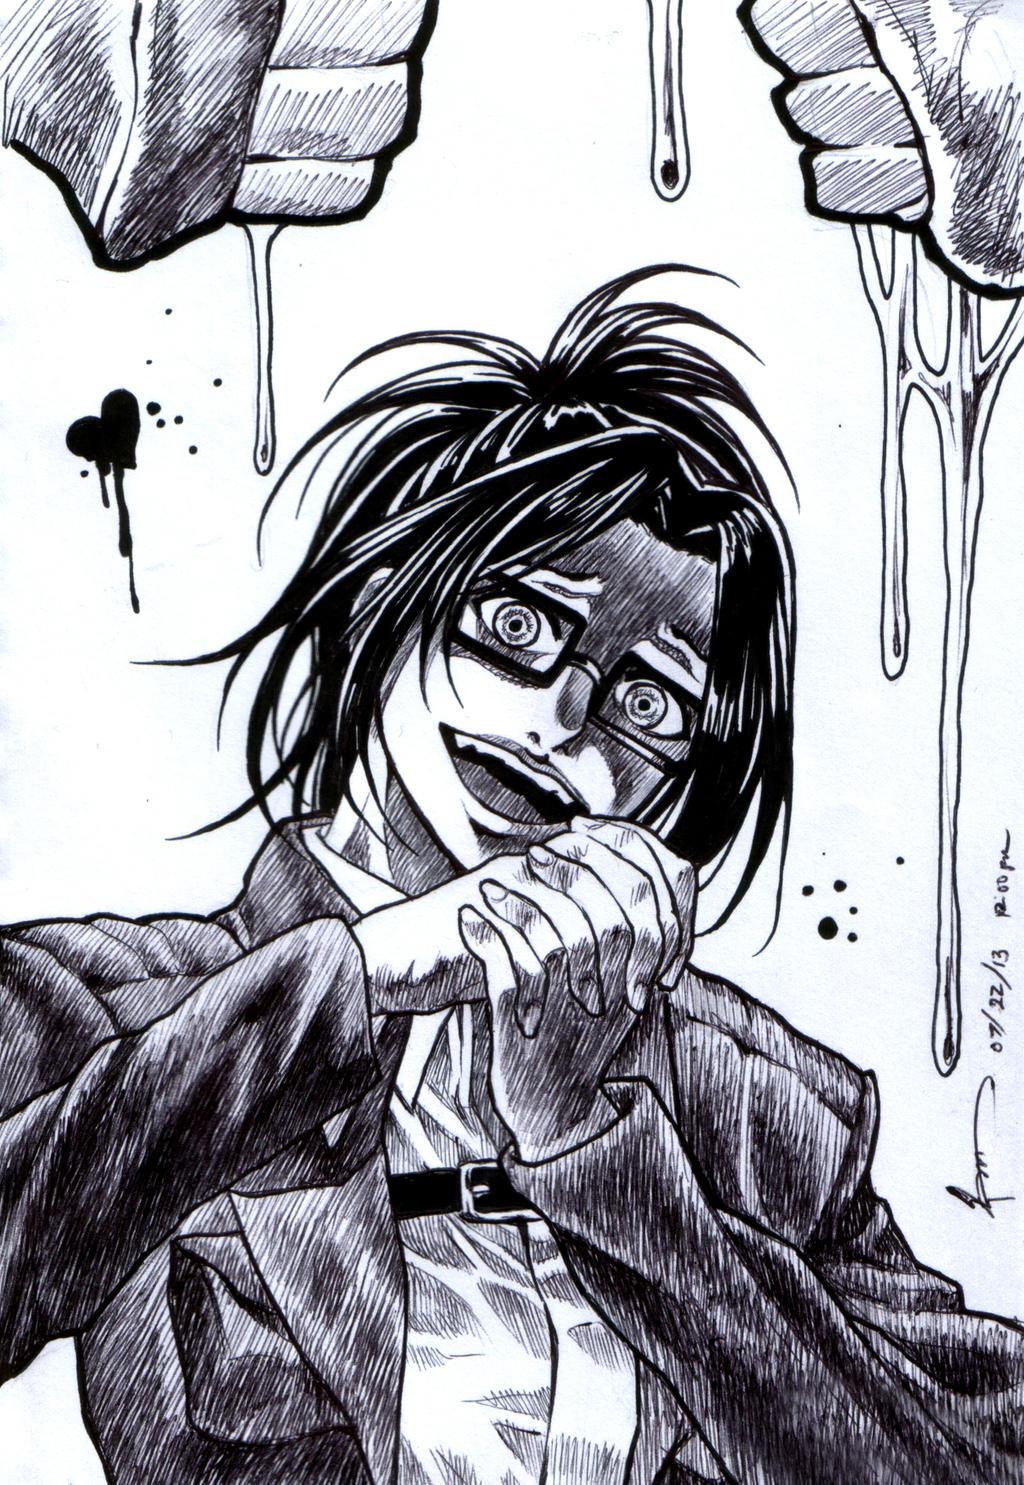 Shingeki No Kyojin Hanji Uncolored by Nick-Ian on DeviantArt